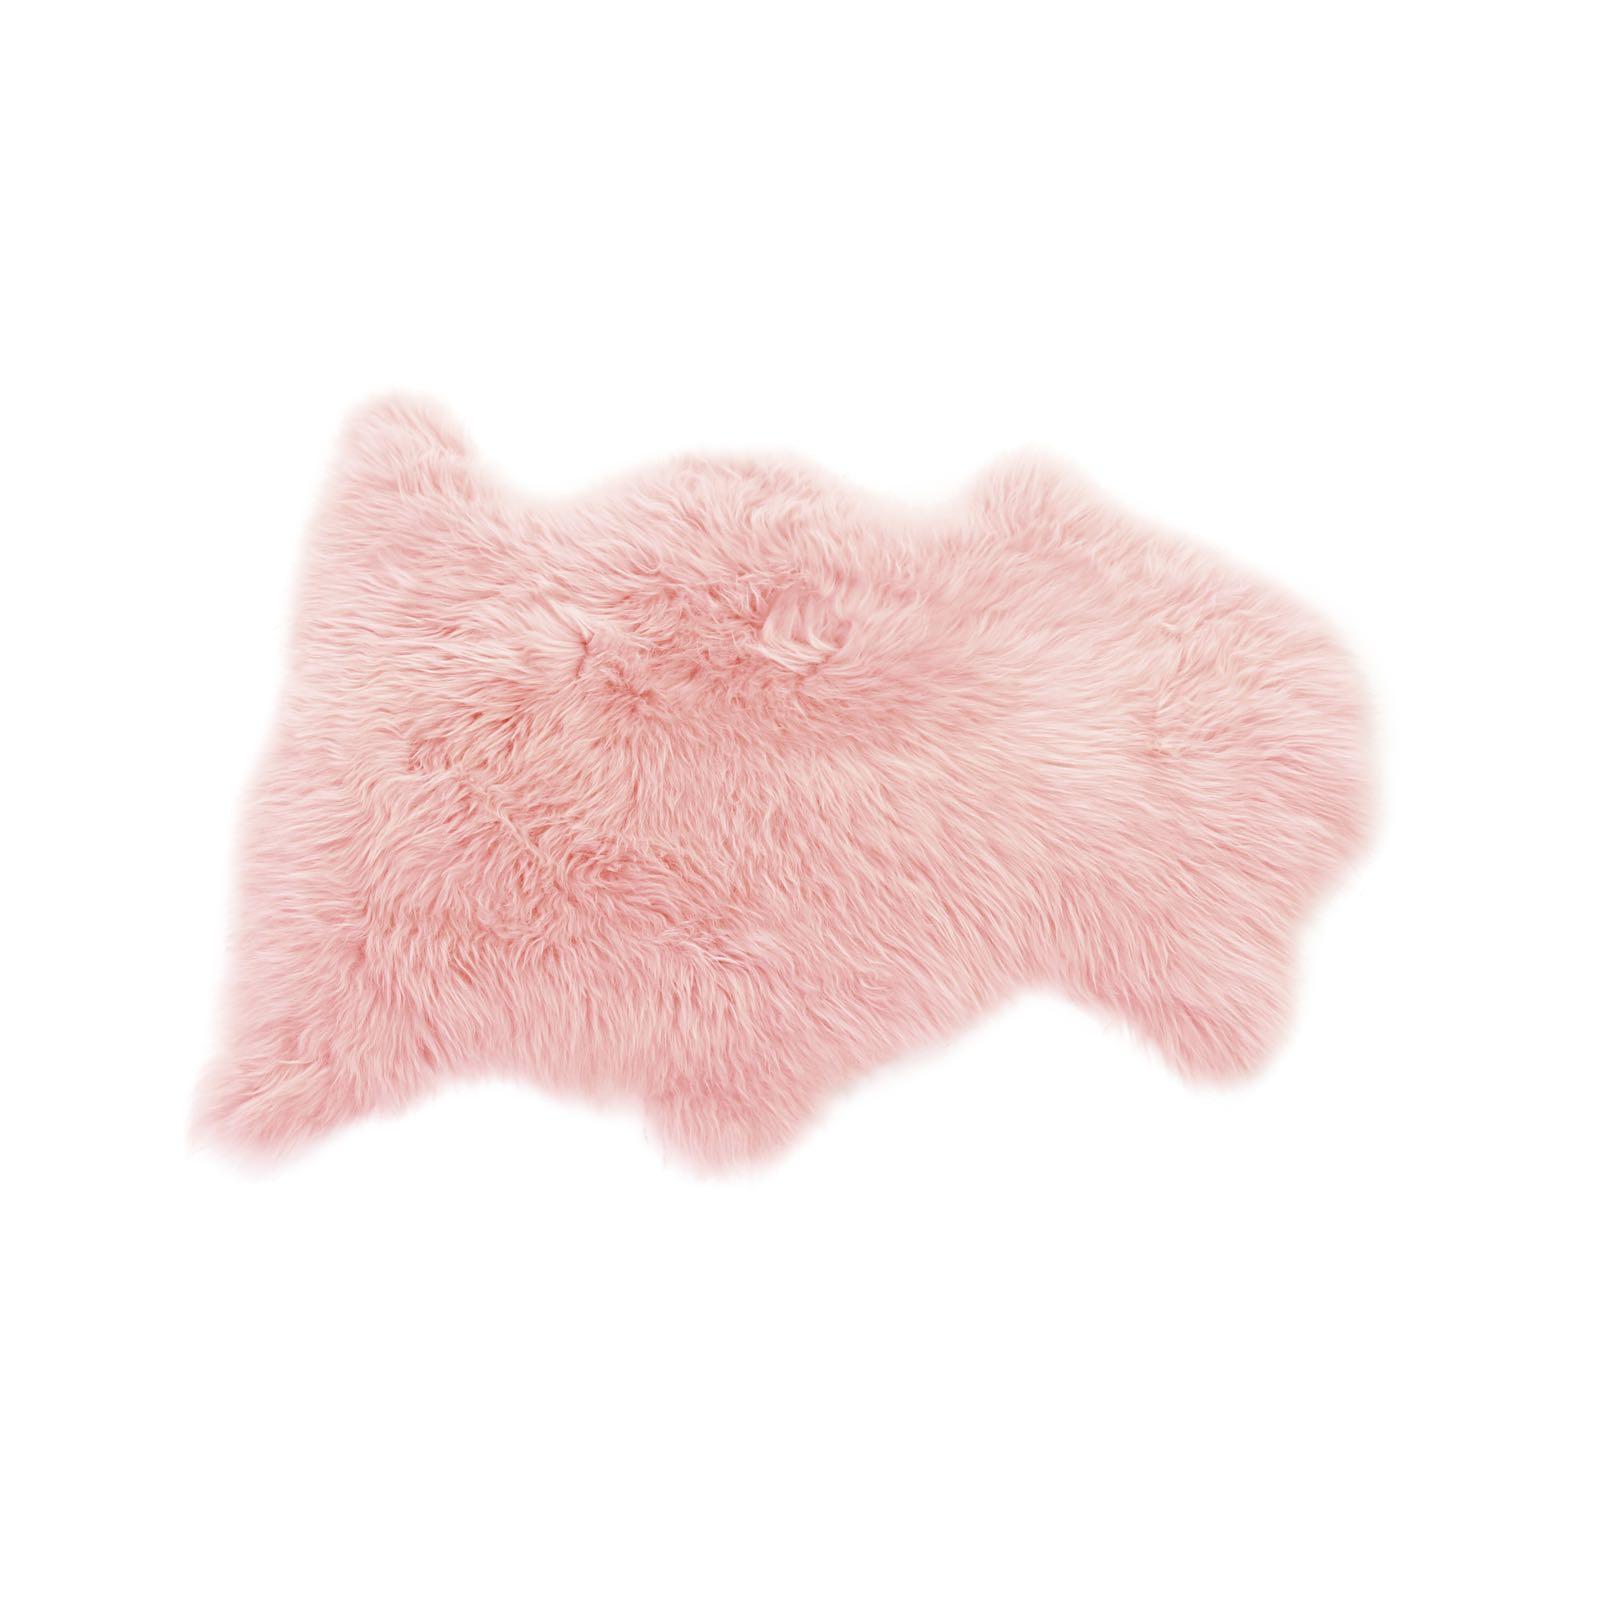 Baa Stool sheepskin rug in dusky pink